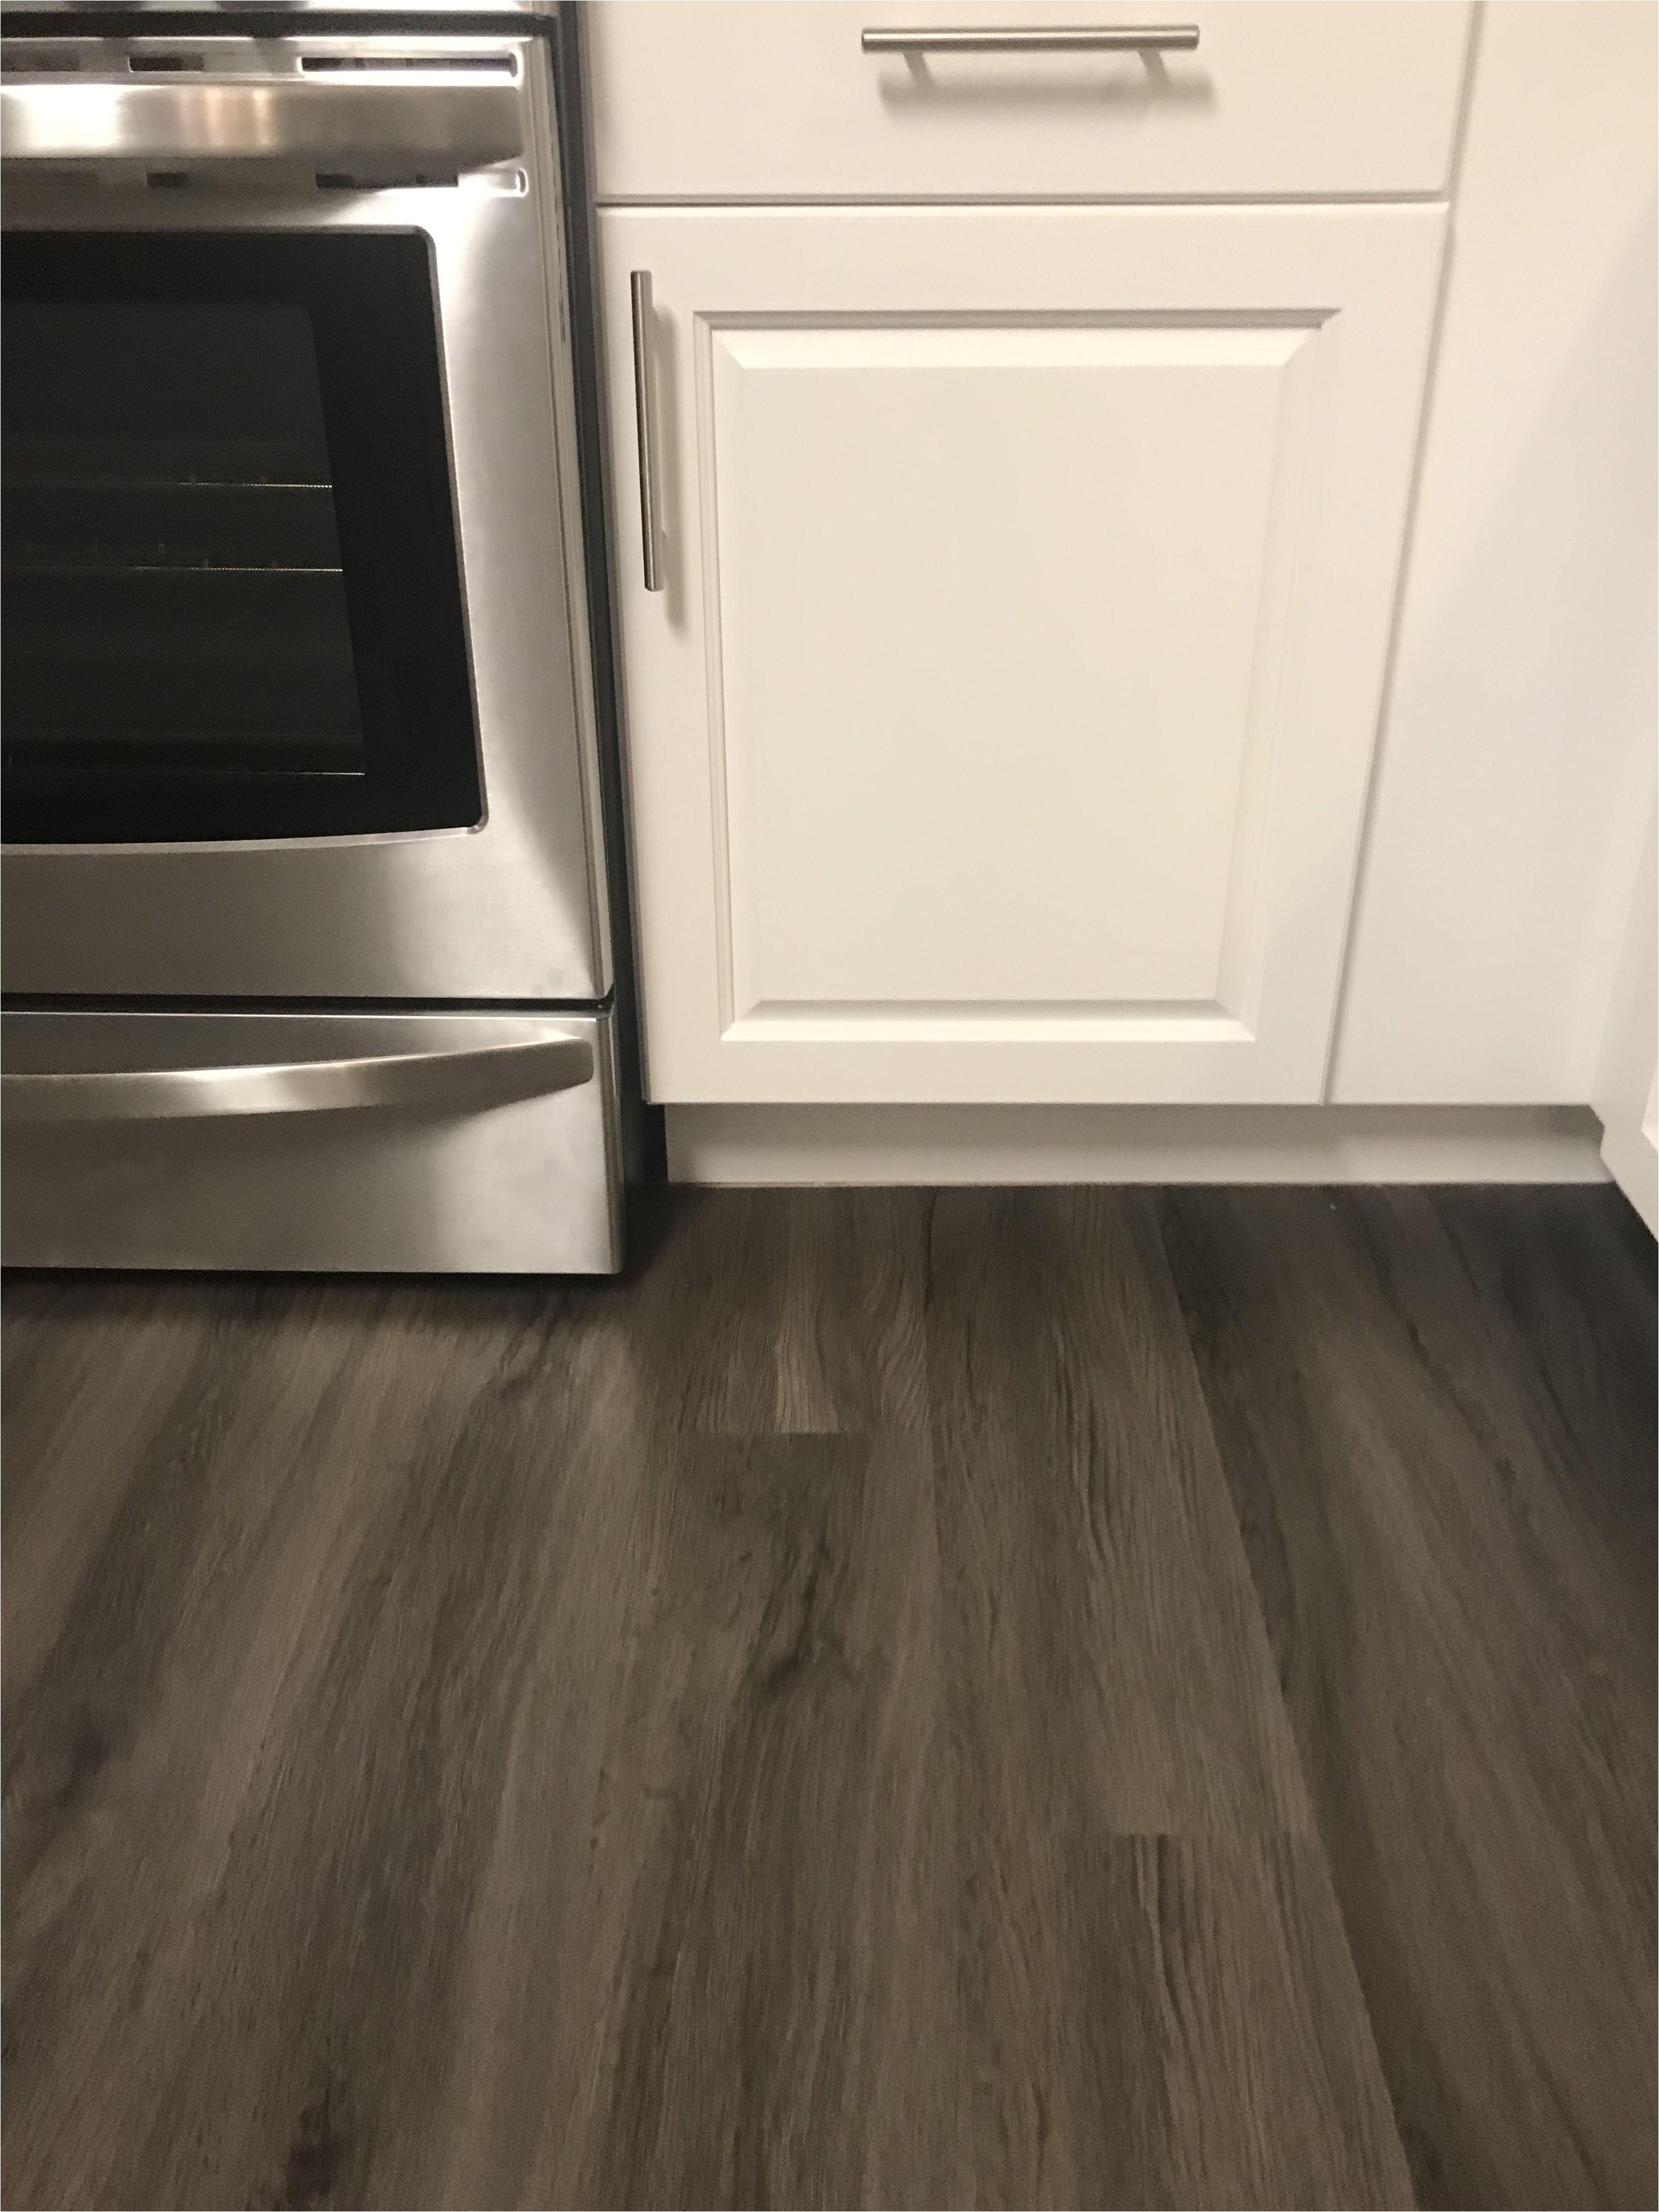 Home Depot Kitchen Flooring Vinyl Lifeproof Seaside Oak 7 1 In X 47 6 In Luxury Vinyl Plank Flooring